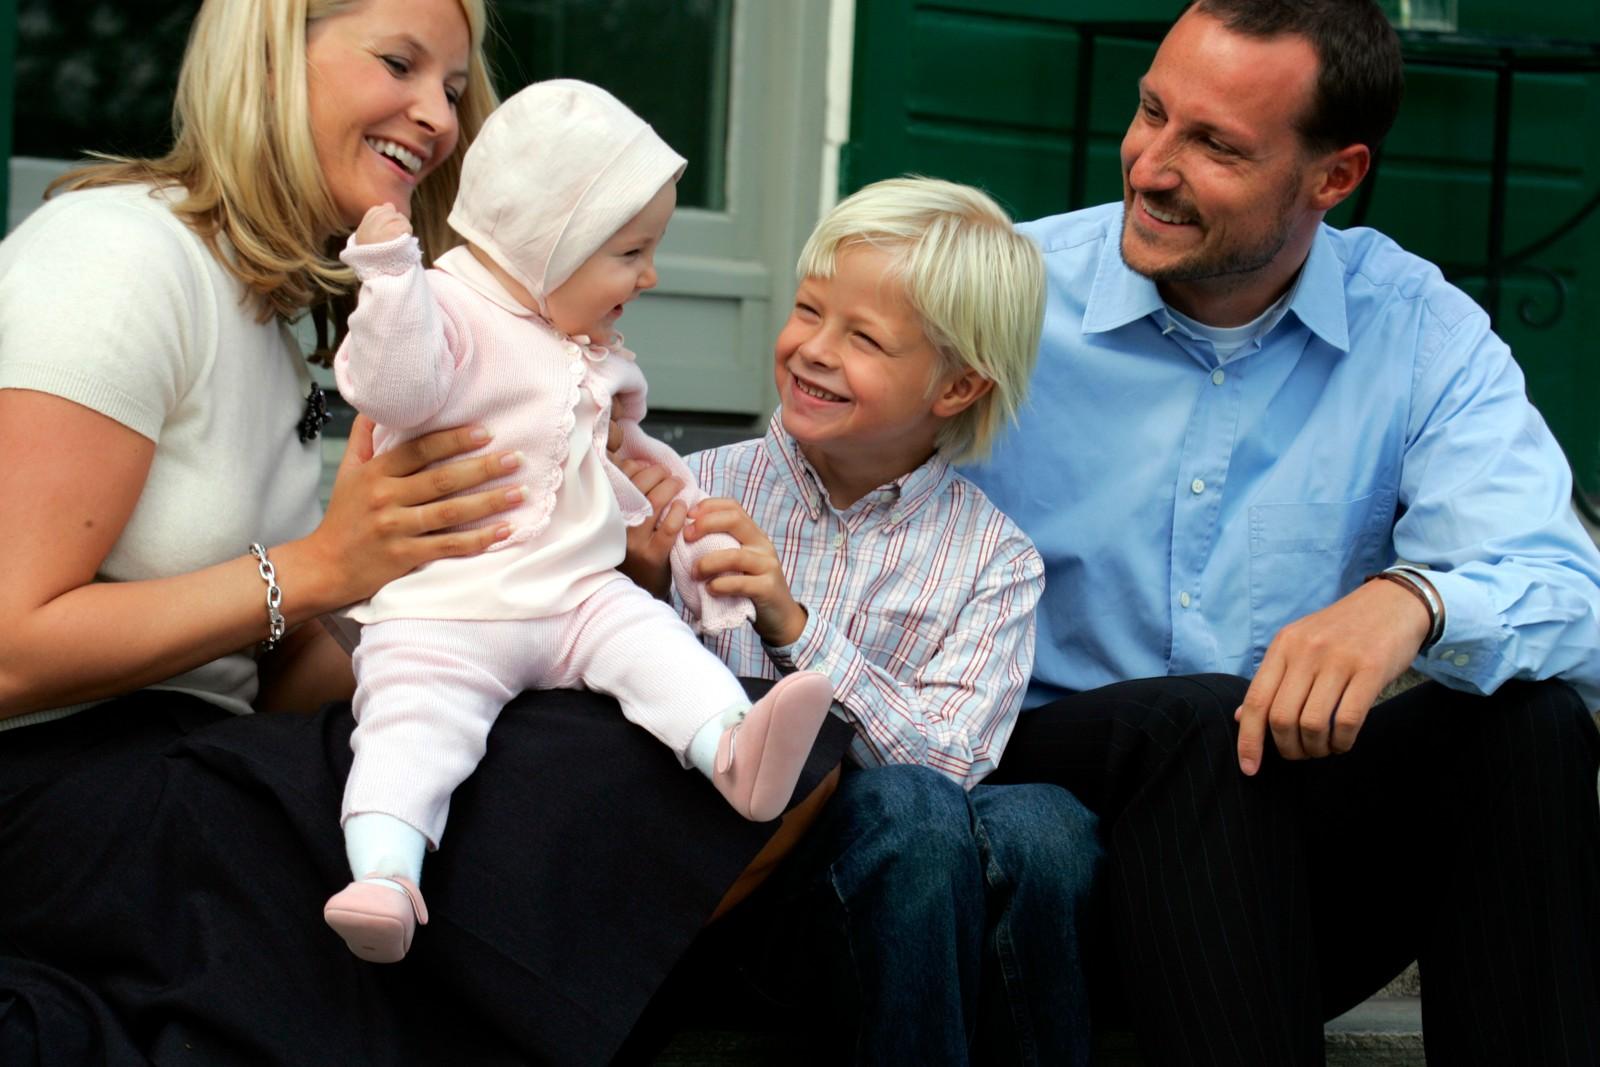 DEN FYRSTE SOMMAREN: Storebror Marius er sju år eldre. Sommaren 2004 stilte kronprinsfamilien til fotografering heime på Skaugum.